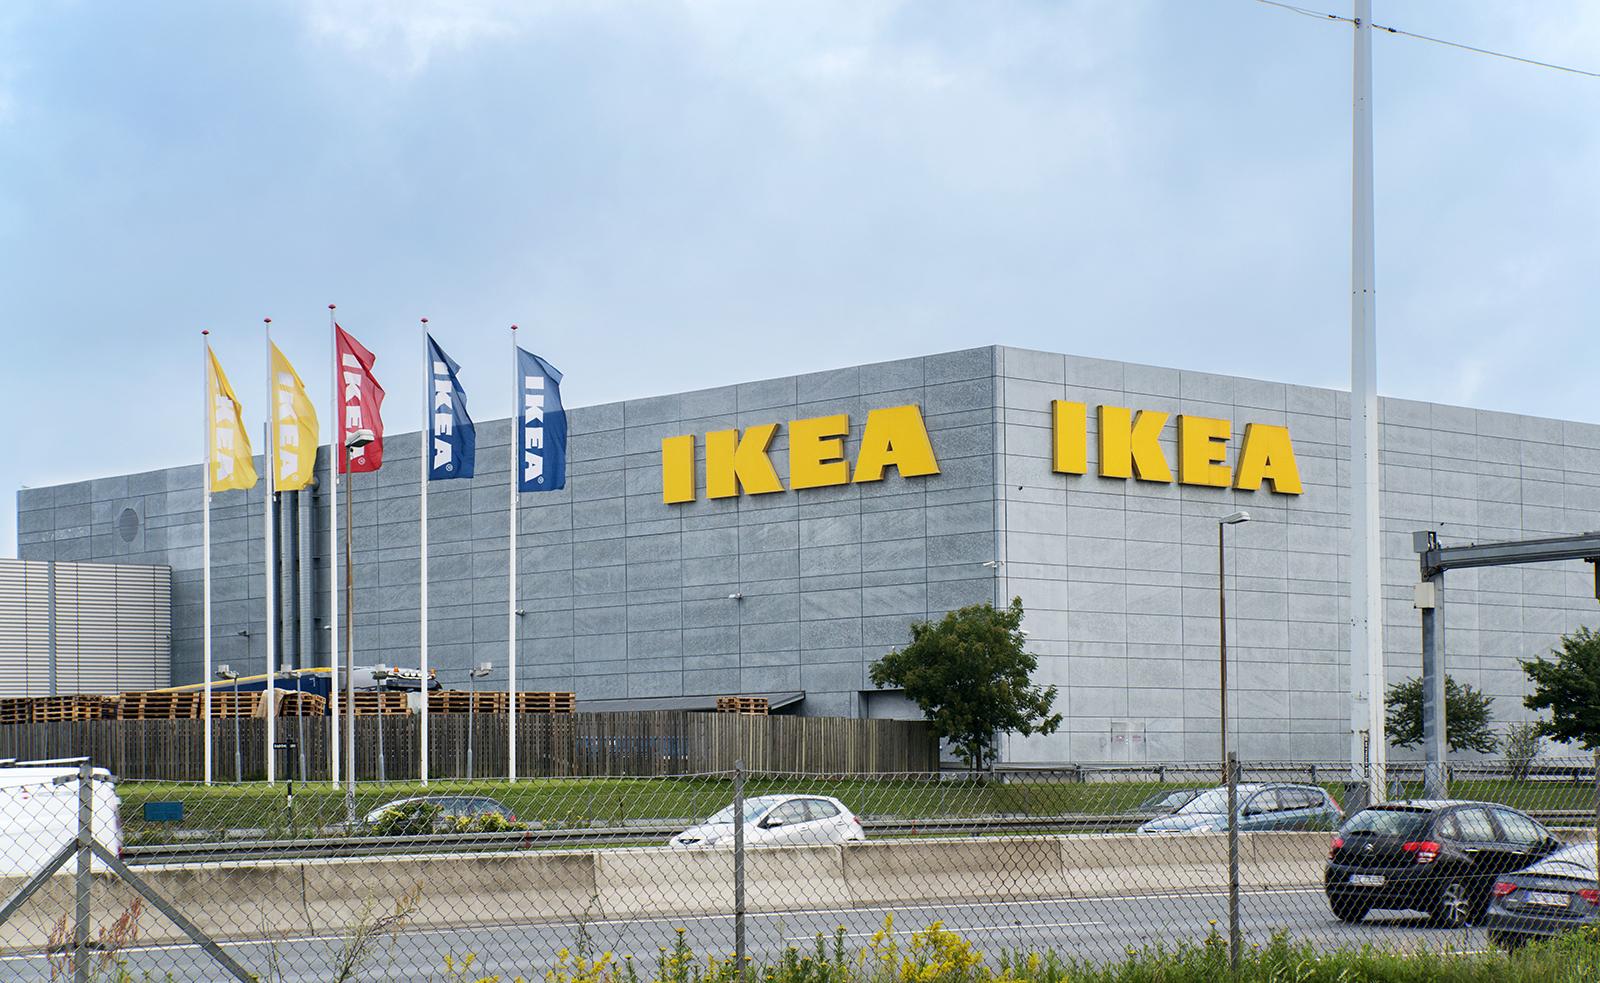 Ikea Kk Kvalitet Amazing Full Size Of Bad Ikea Klemmregal Bad Ikea Gnstig Online Kaufen With